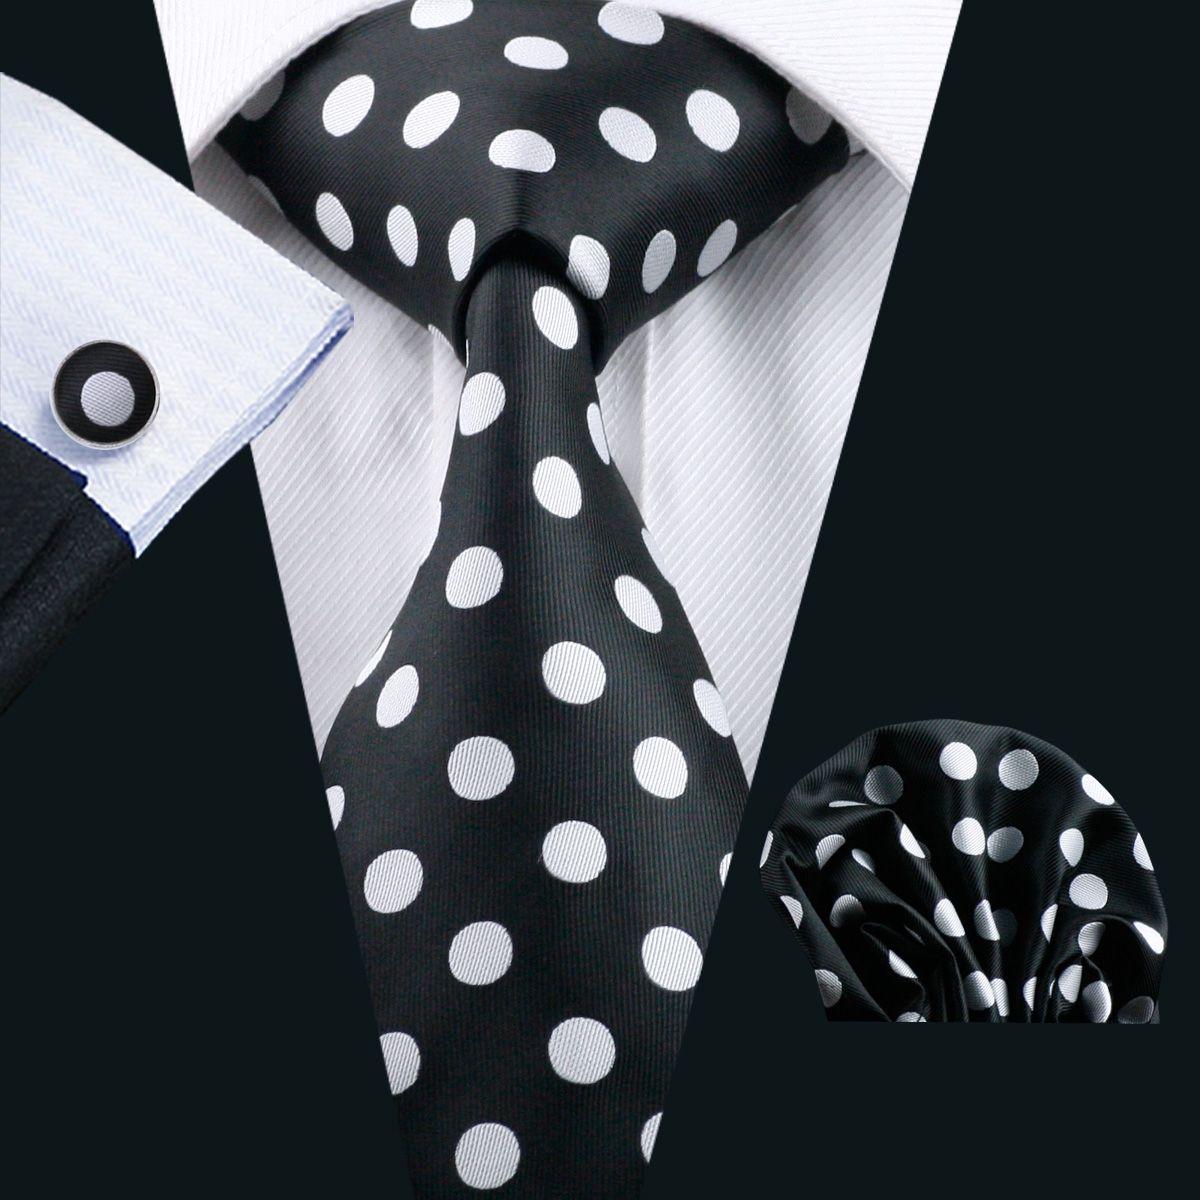 5640e46183c2 2019 Black Tie White Dot Mens Tie Pocket Square Cufflinks Set 8.5cm Width  Meeting Business Casual Party Necktie Jacquard Woven N 1190 From  Doris_0115, ...